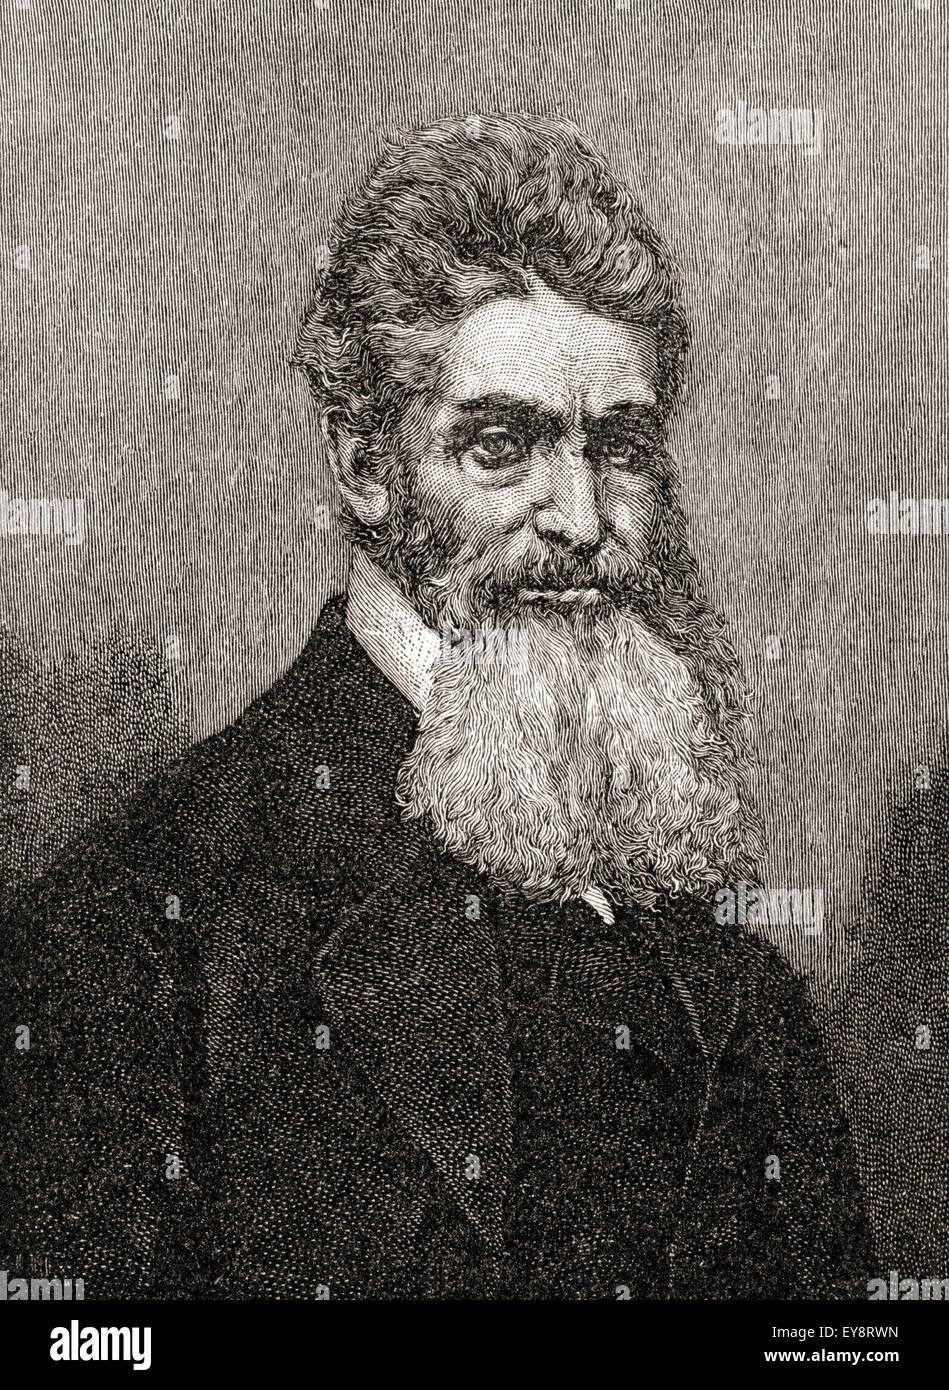 John Brown, 1800 - 1859. Abolicionista americano blanco. Foto de stock